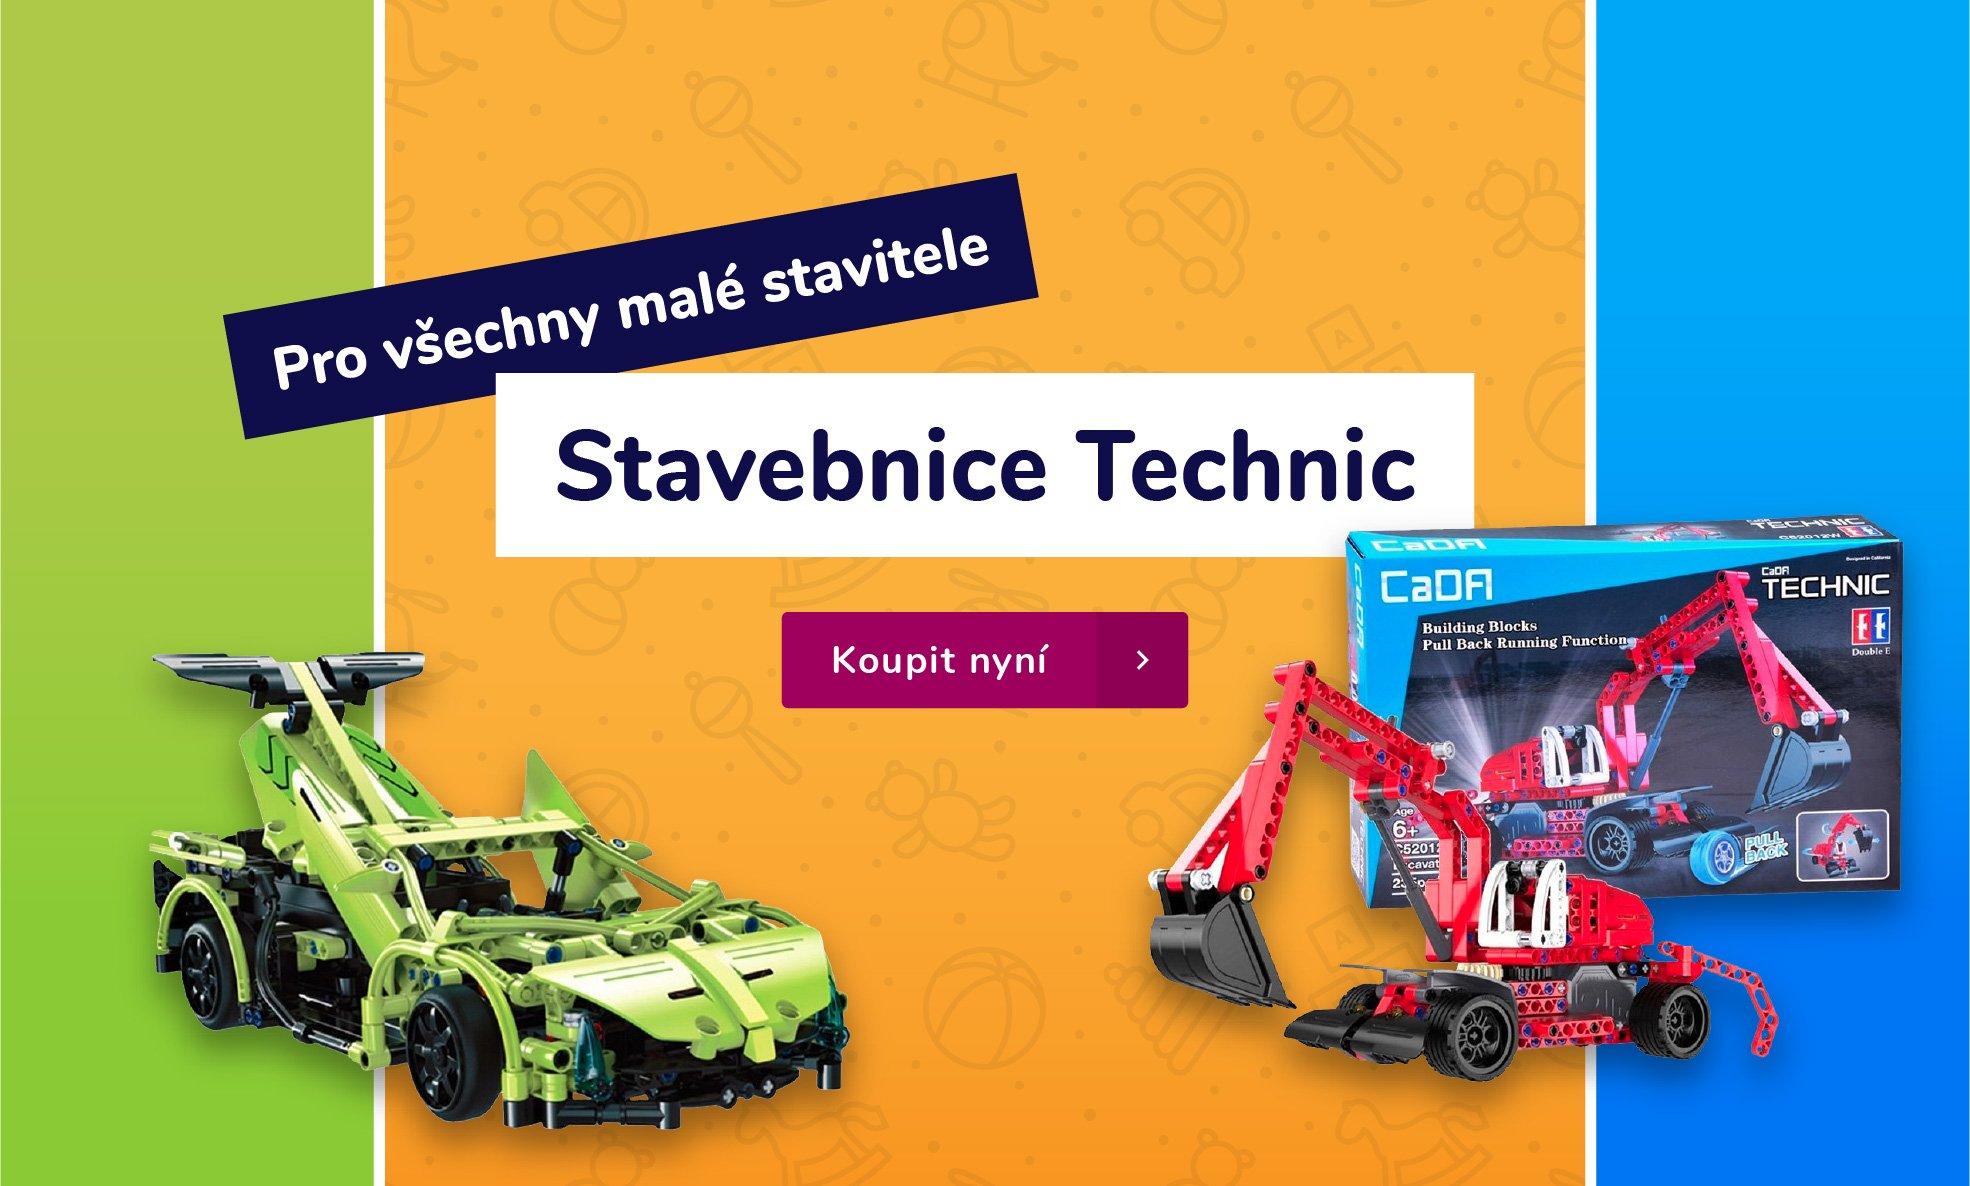 Stavebnice Technic